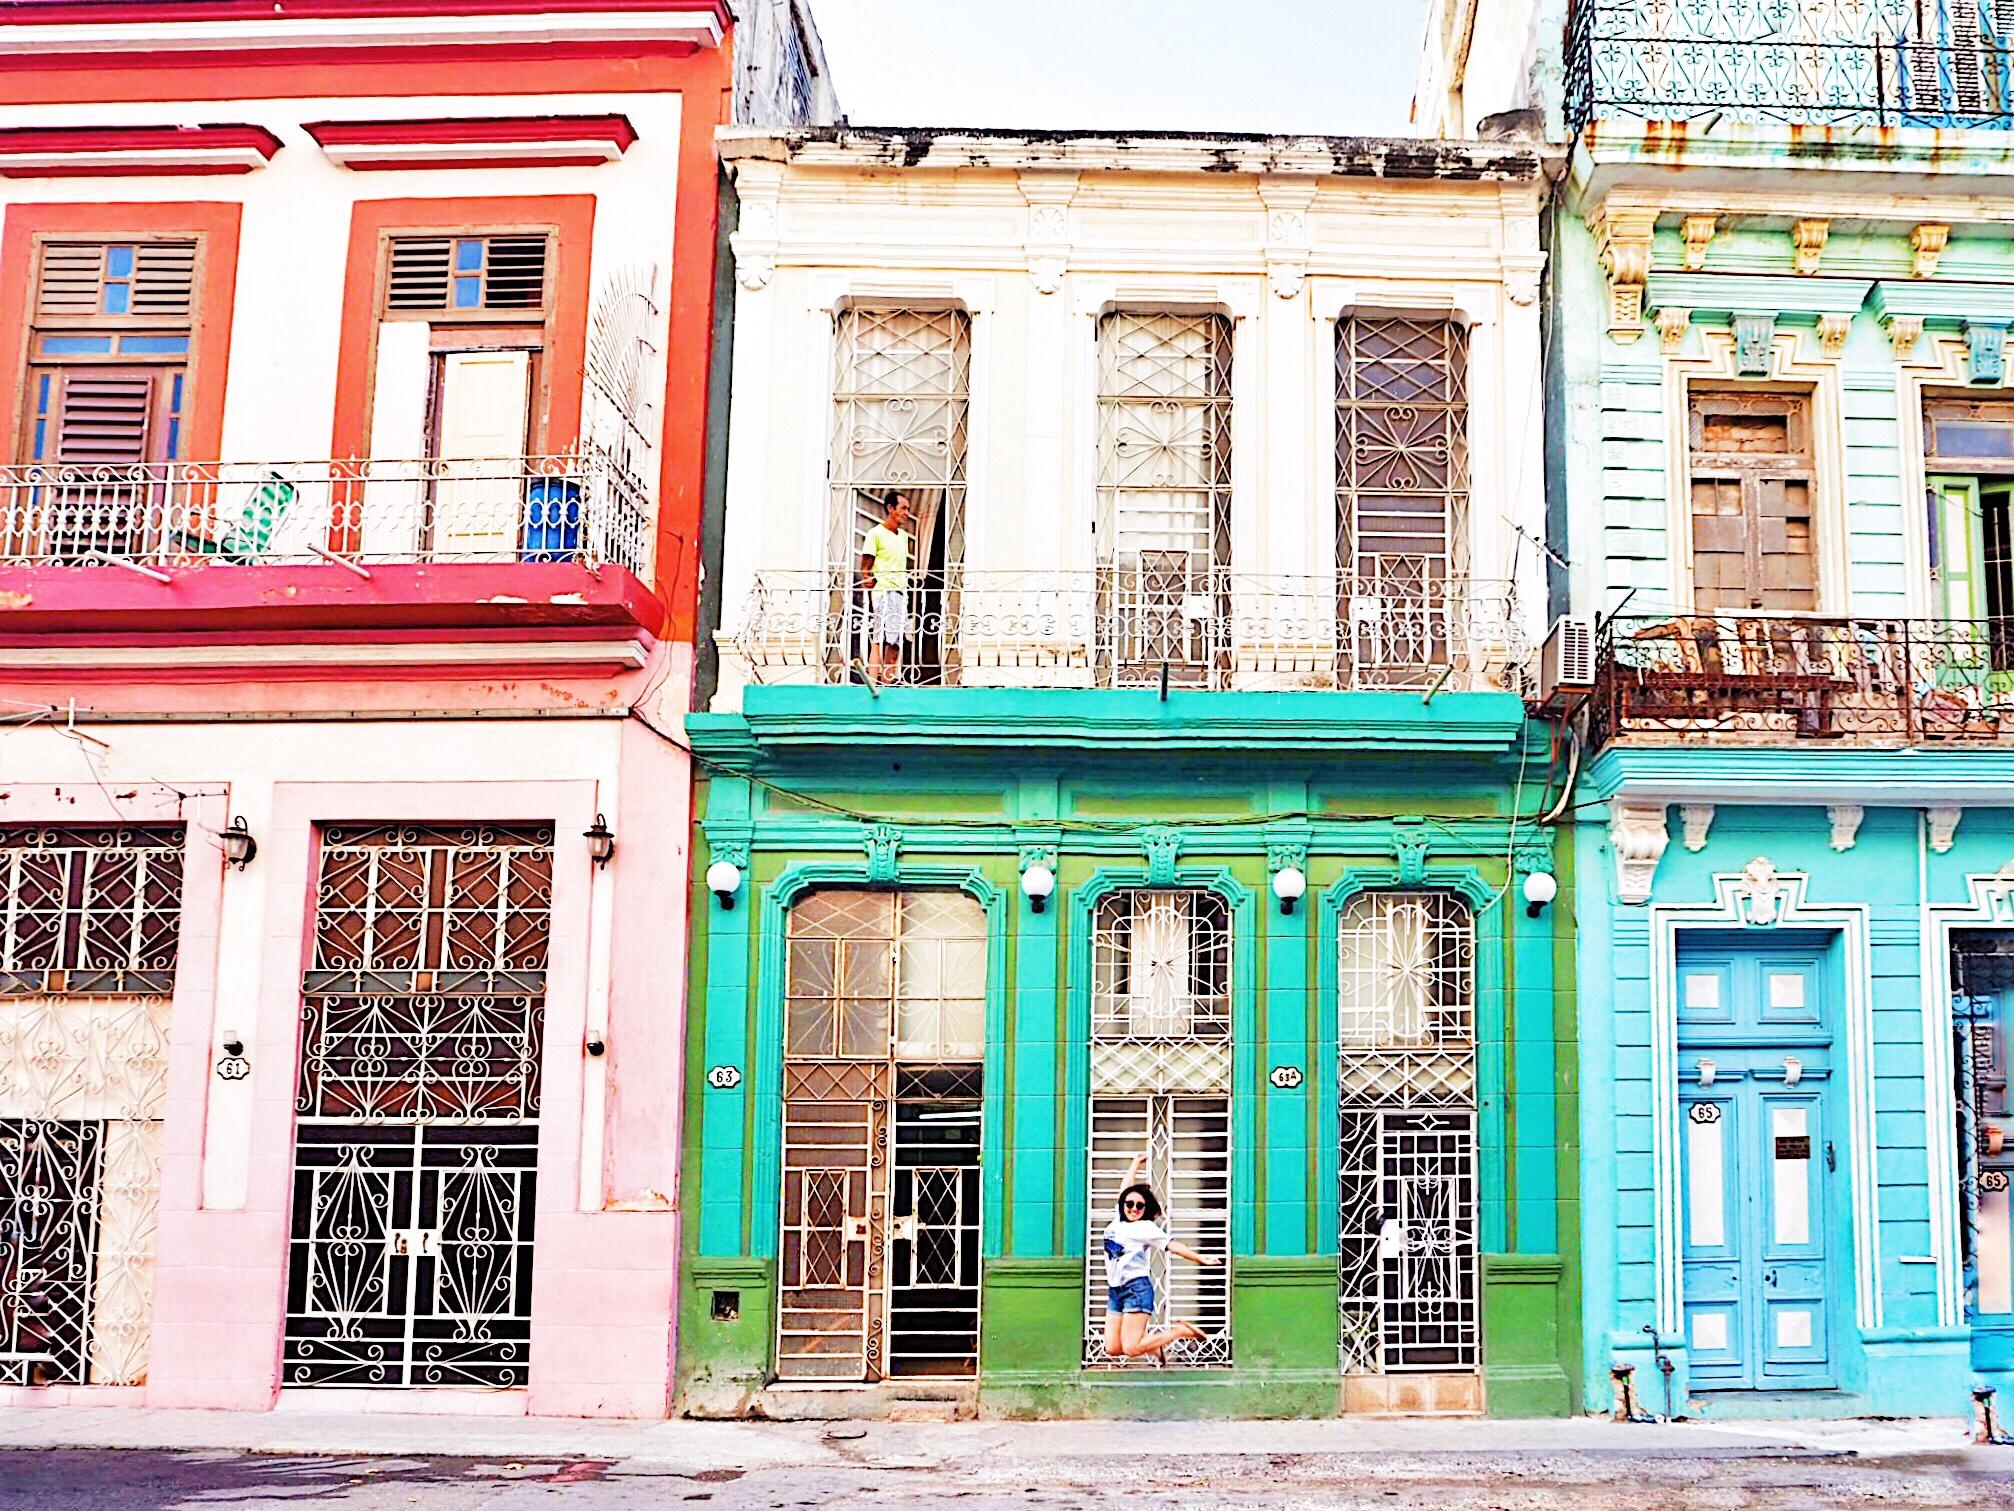 61ea5563 7aa6 4401 a890 79e89d011133 - Old Habana - 街全体が世界遺産 色が溢れるハバナ旧市街散歩で出会った風景